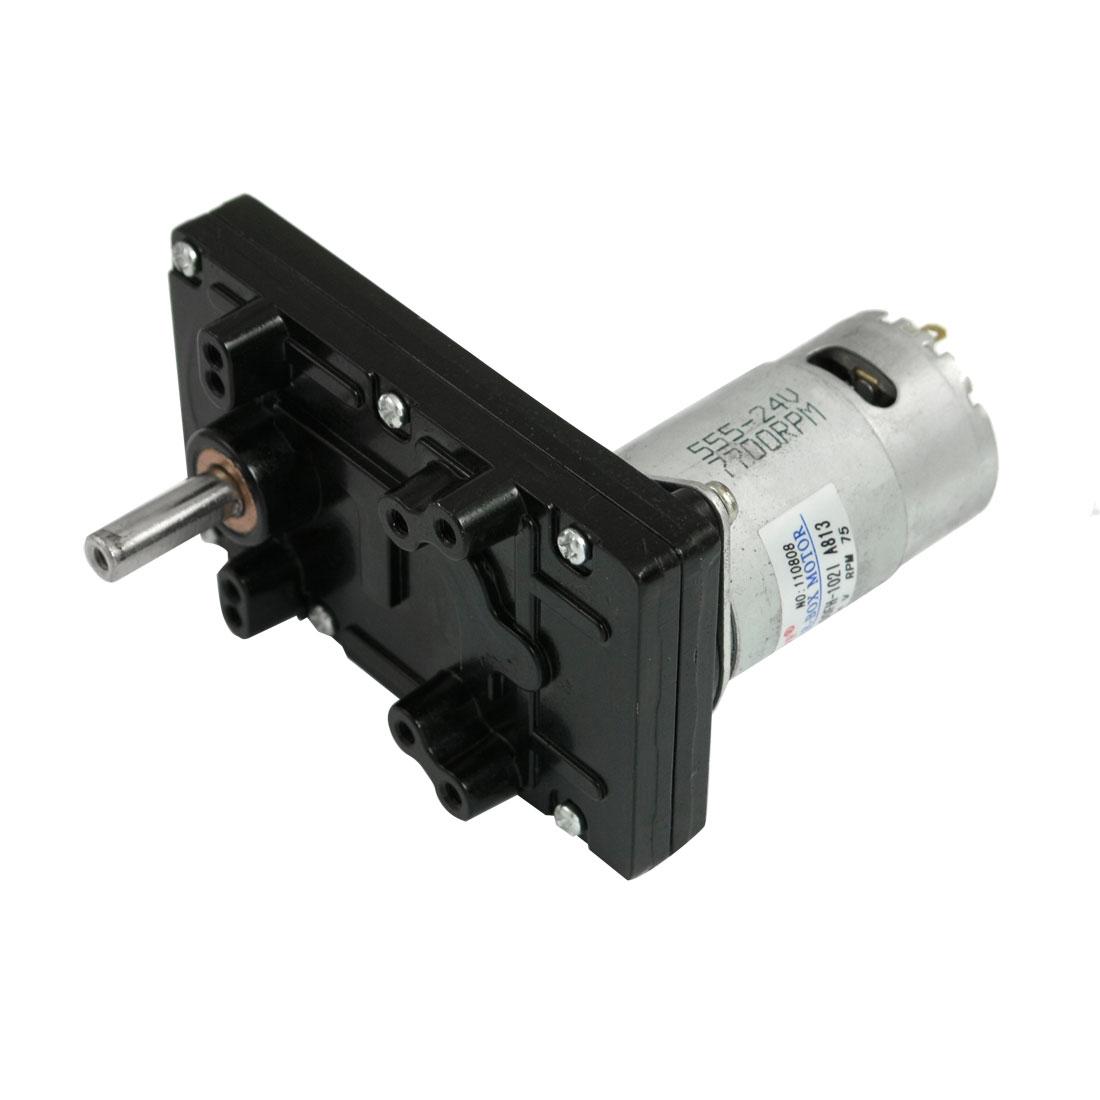 4.13kg.cm Torque 37mm Dia Magnetic Gear Box Motor 75 RPM 150mA 24V DC